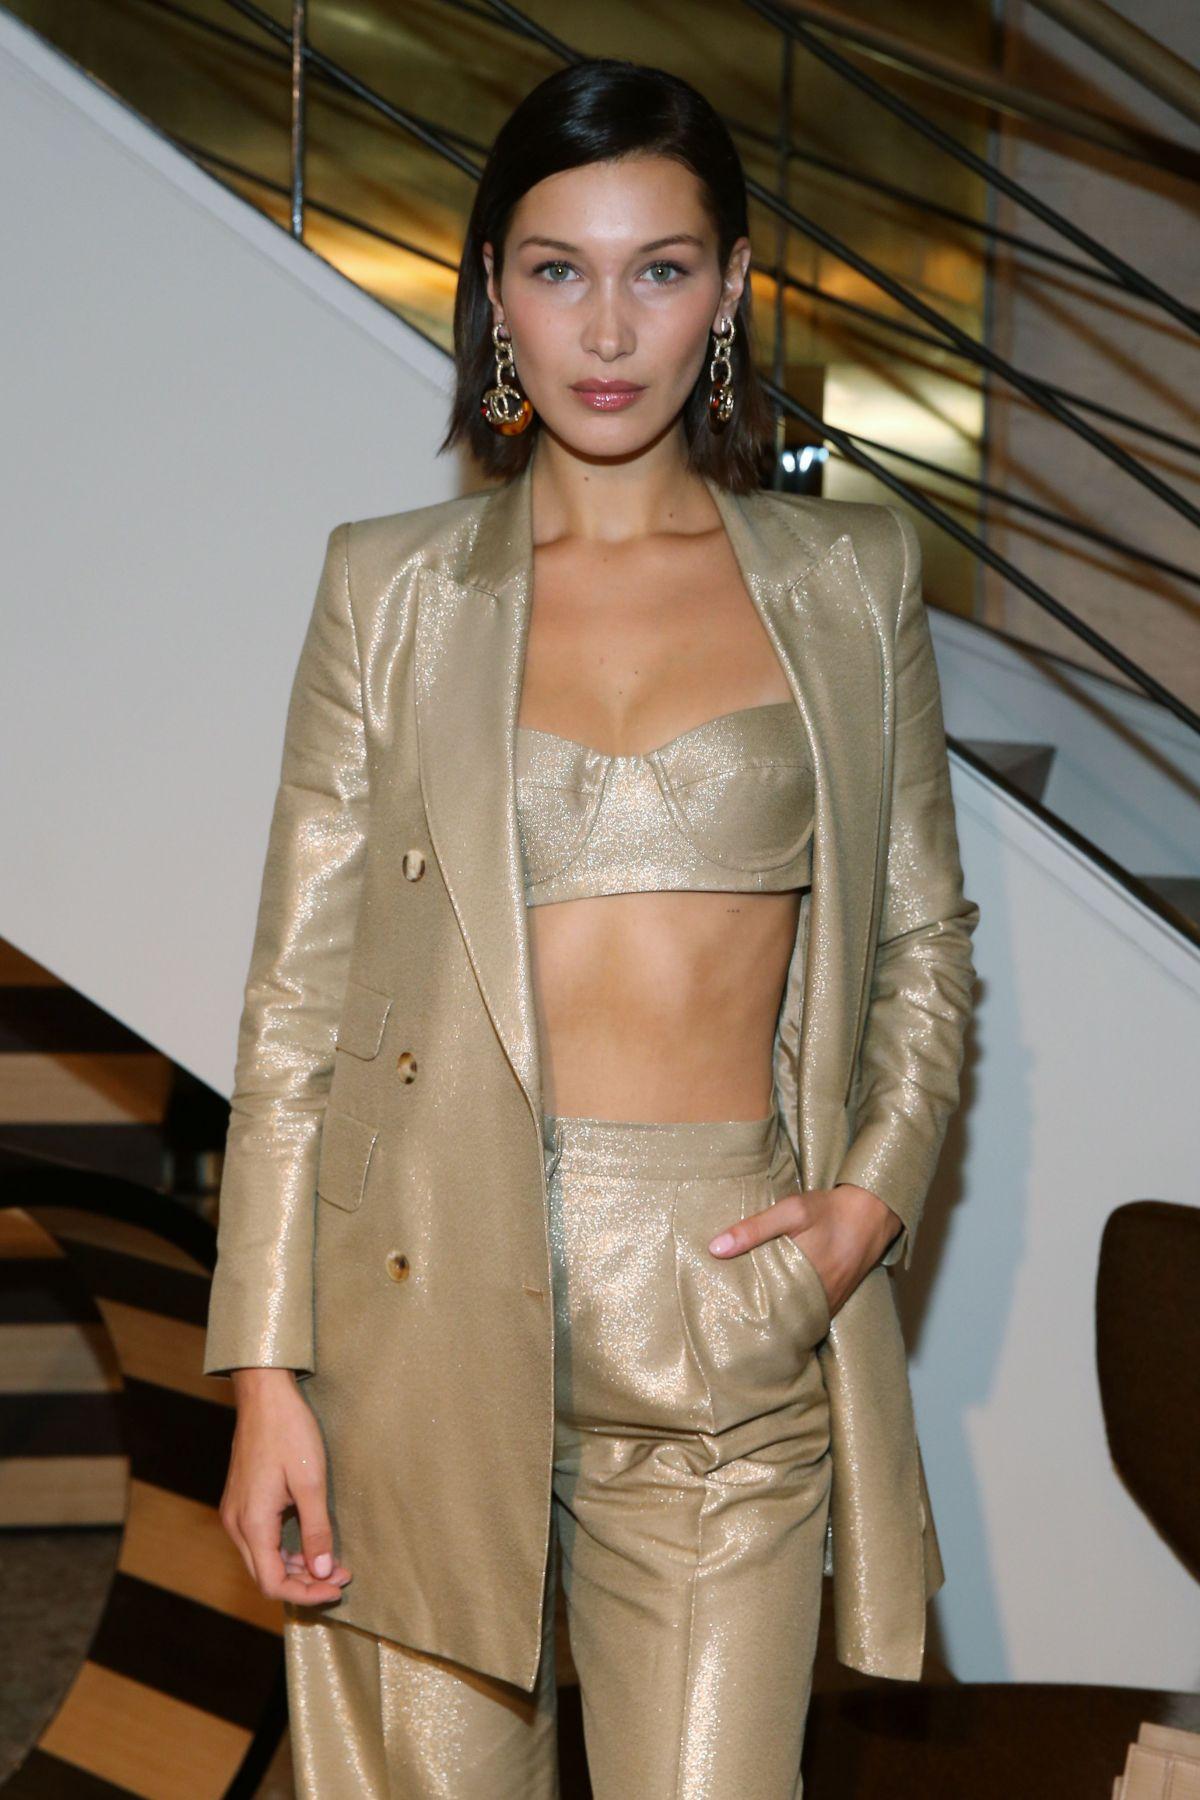 Bikini Jessica Rose nudes (37 photo), Tits, Cleavage, Boobs, braless 2015